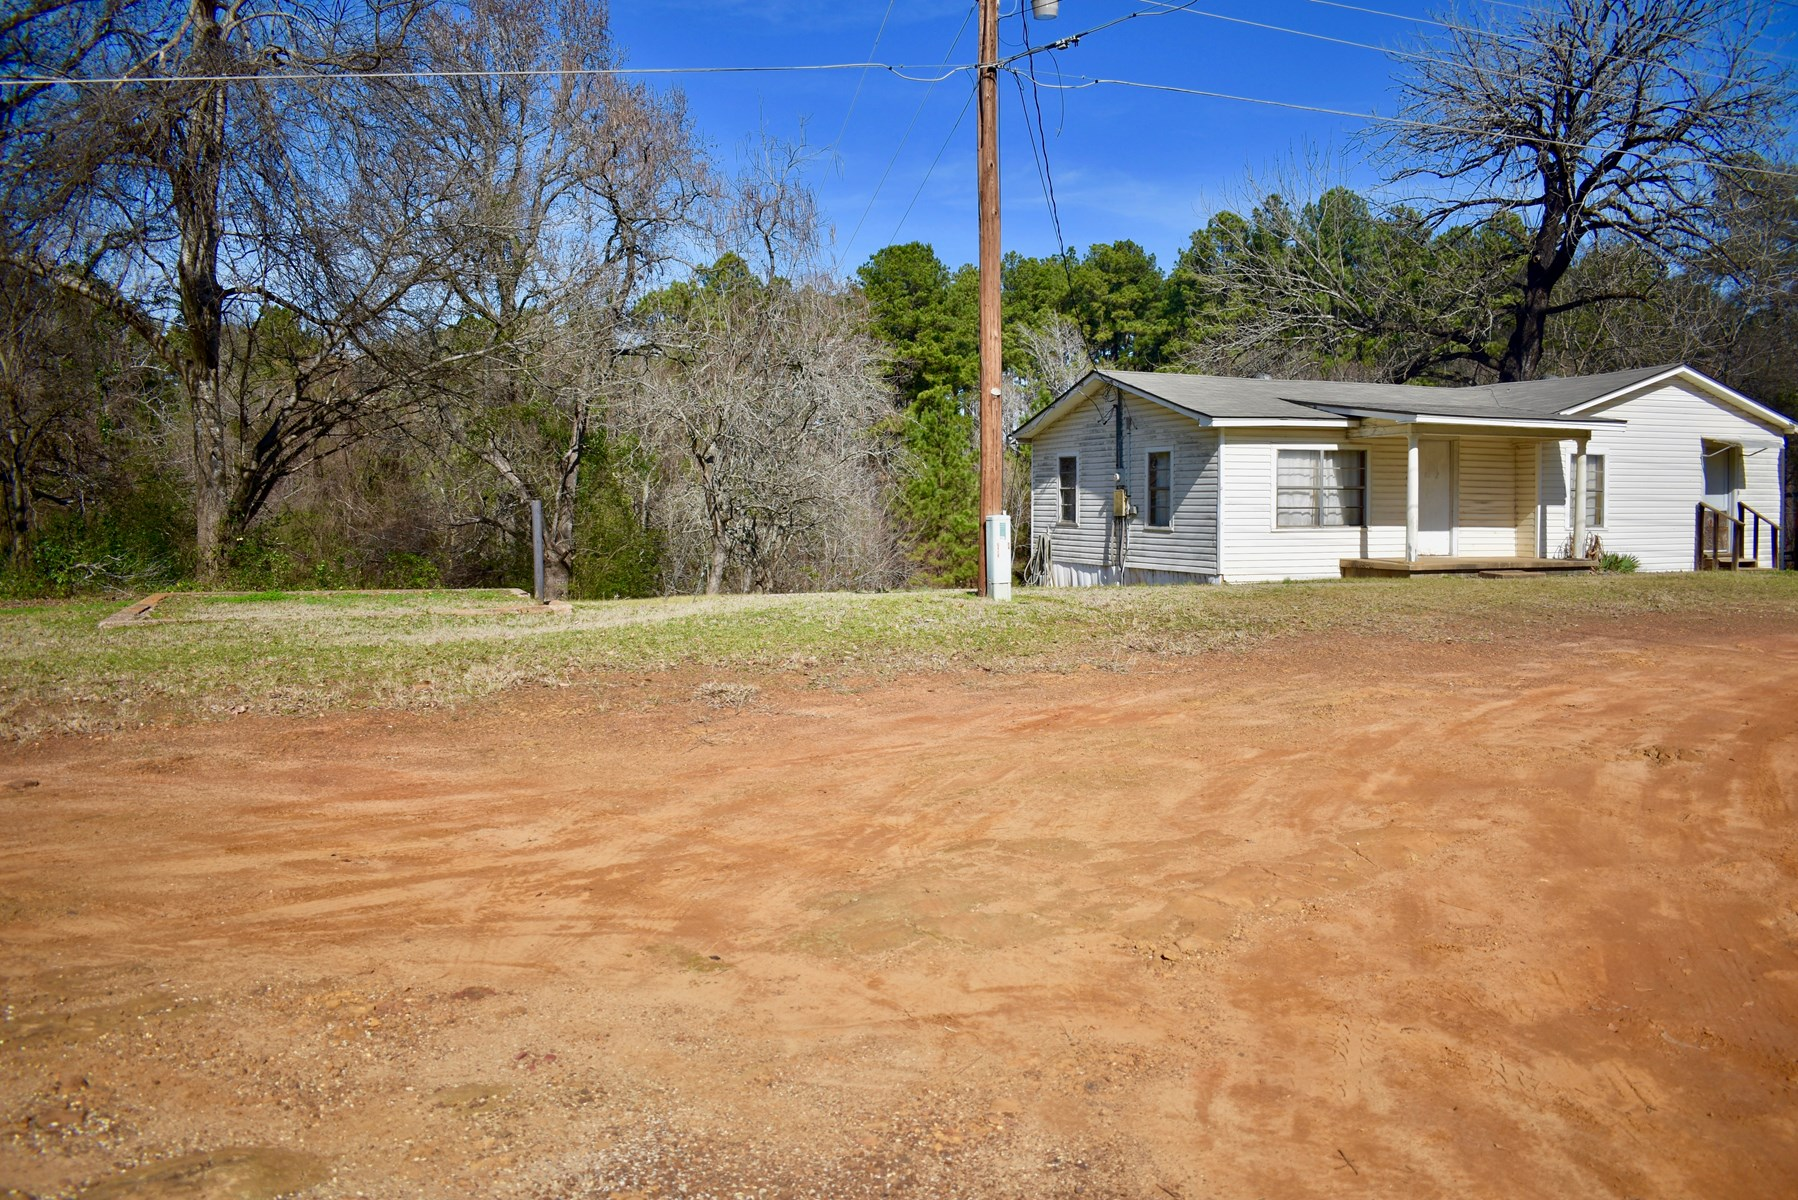 Home For Sale, Kilgore, Texas